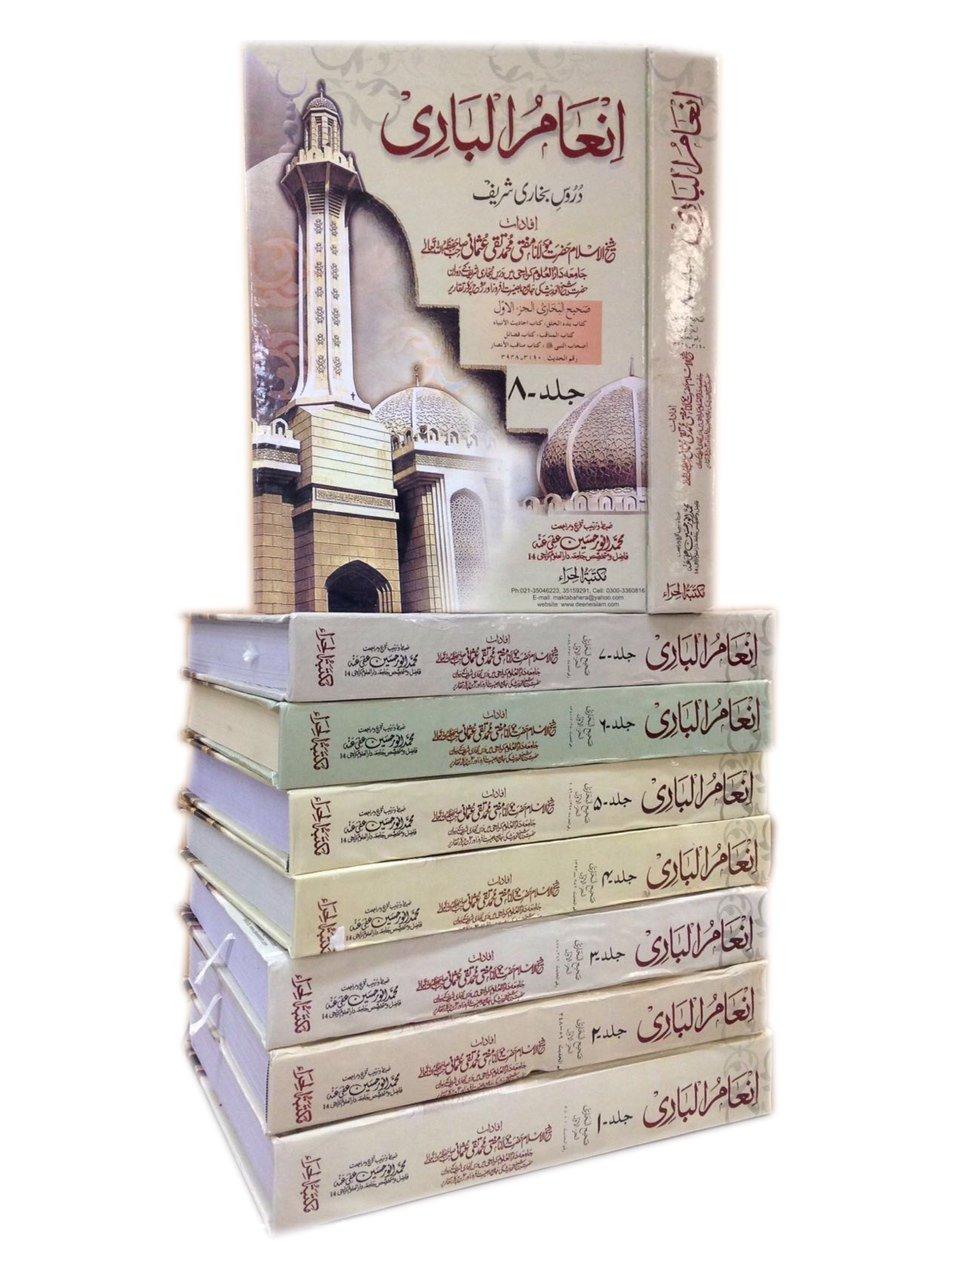 New Ina'am ul Bari Sharah Sahih Al Bukhari 8 Volume Set (Dars-e Bukhari by Mufti Muhammad Taqi Usmani) PDF